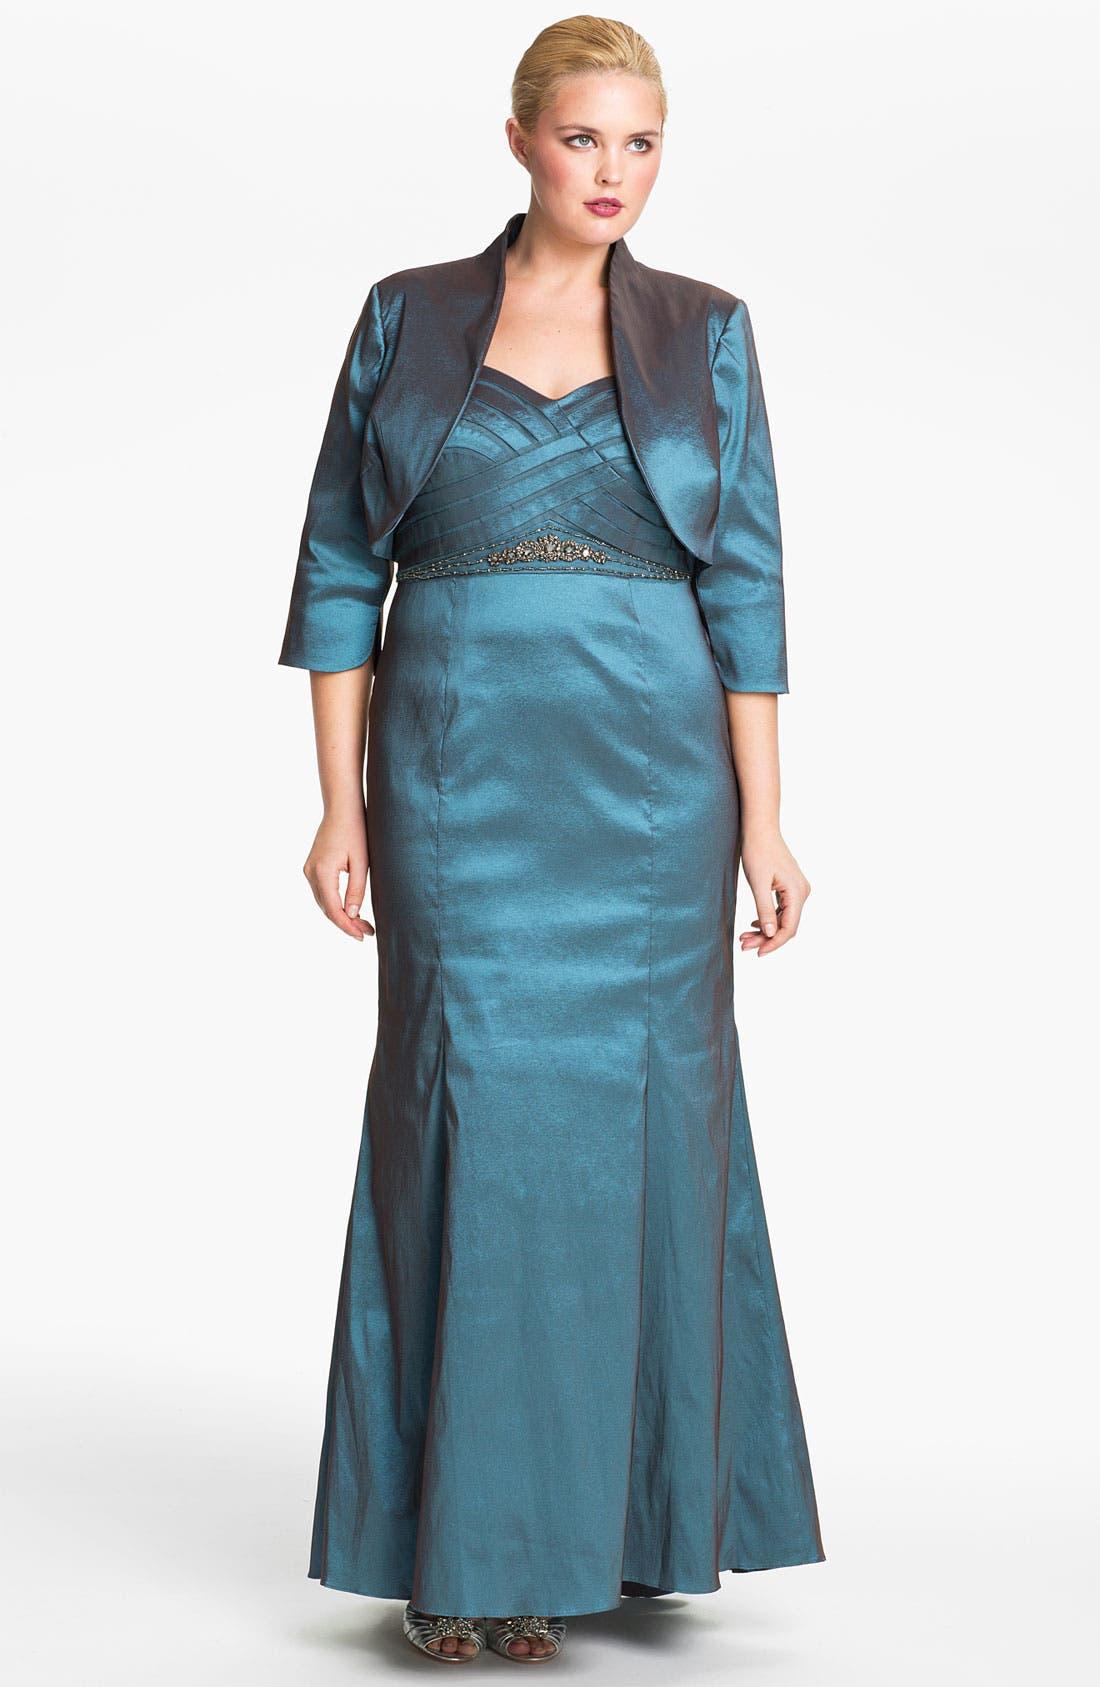 Alternate Image 1 Selected - Adrianna Papell Taffeta Mermaid Gown & Bolero (Plus)